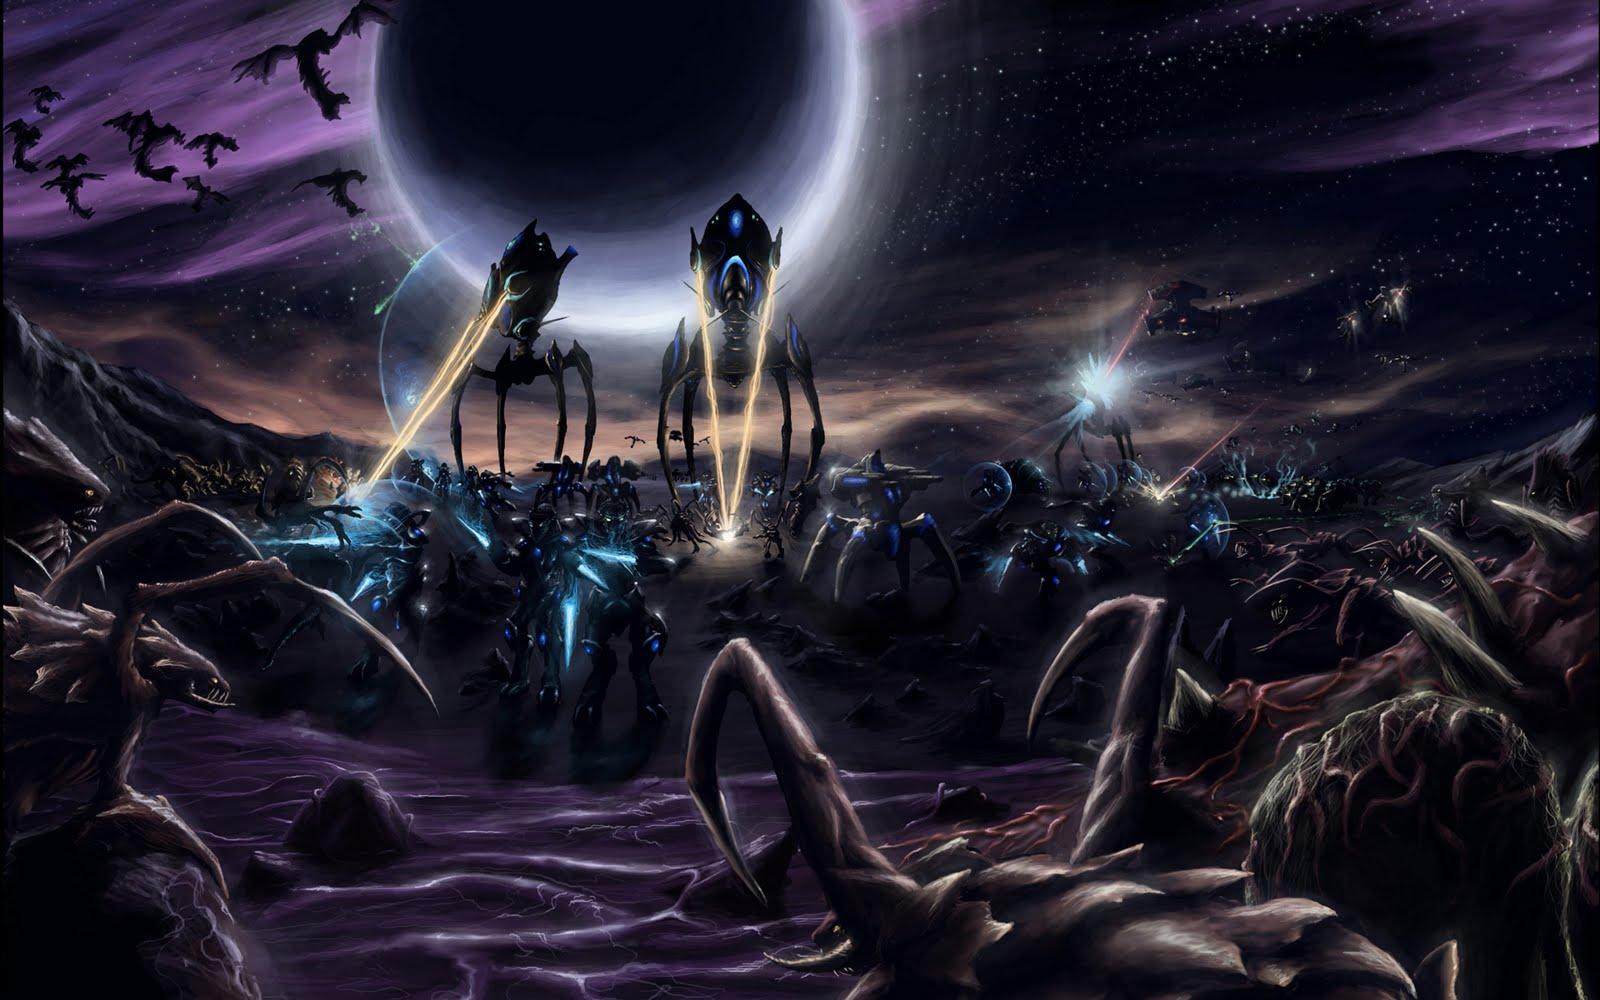 http://1.bp.blogspot.com/-gW5LpXEsqF8/TcIenJCekJI/AAAAAAAAAso/DDUmhkNmHBA/s1600/protoss+vs+Zerg+Starcraft+Wallpaper.jpg